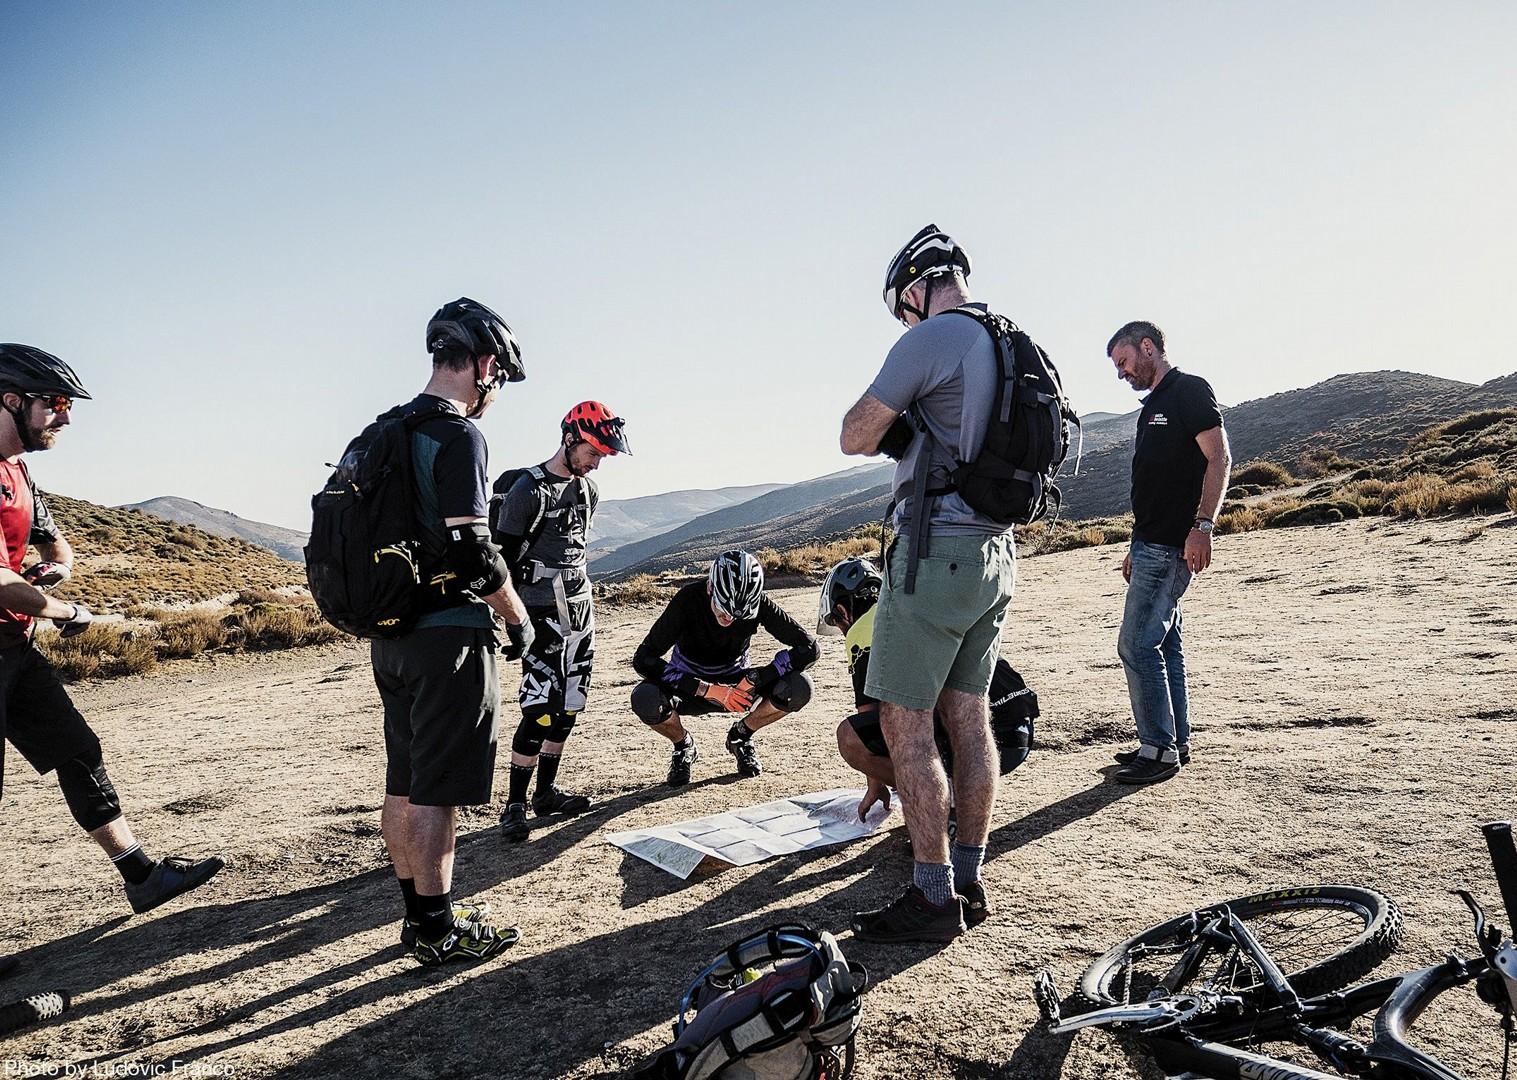 cycling-in-spain-sierra-nevada.jpg - Spain - Sensational Sierra Nevada - Mountain Biking